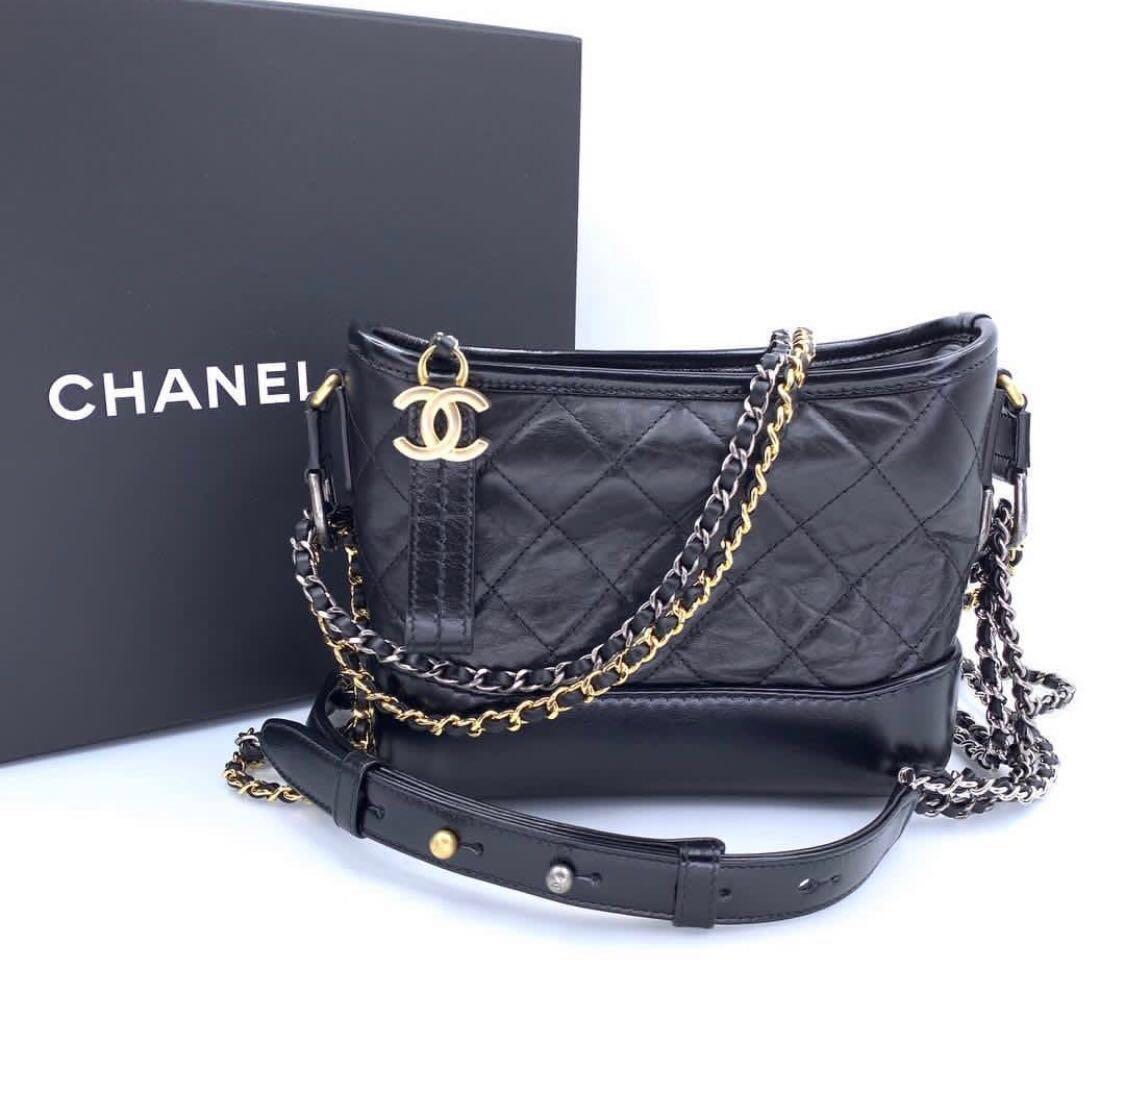 ec34d8ede9d0dd BNIB! CHANEL SMALL BLACK GABRIELLE HOBO BAG, Luxury, Bags & Wallets ...